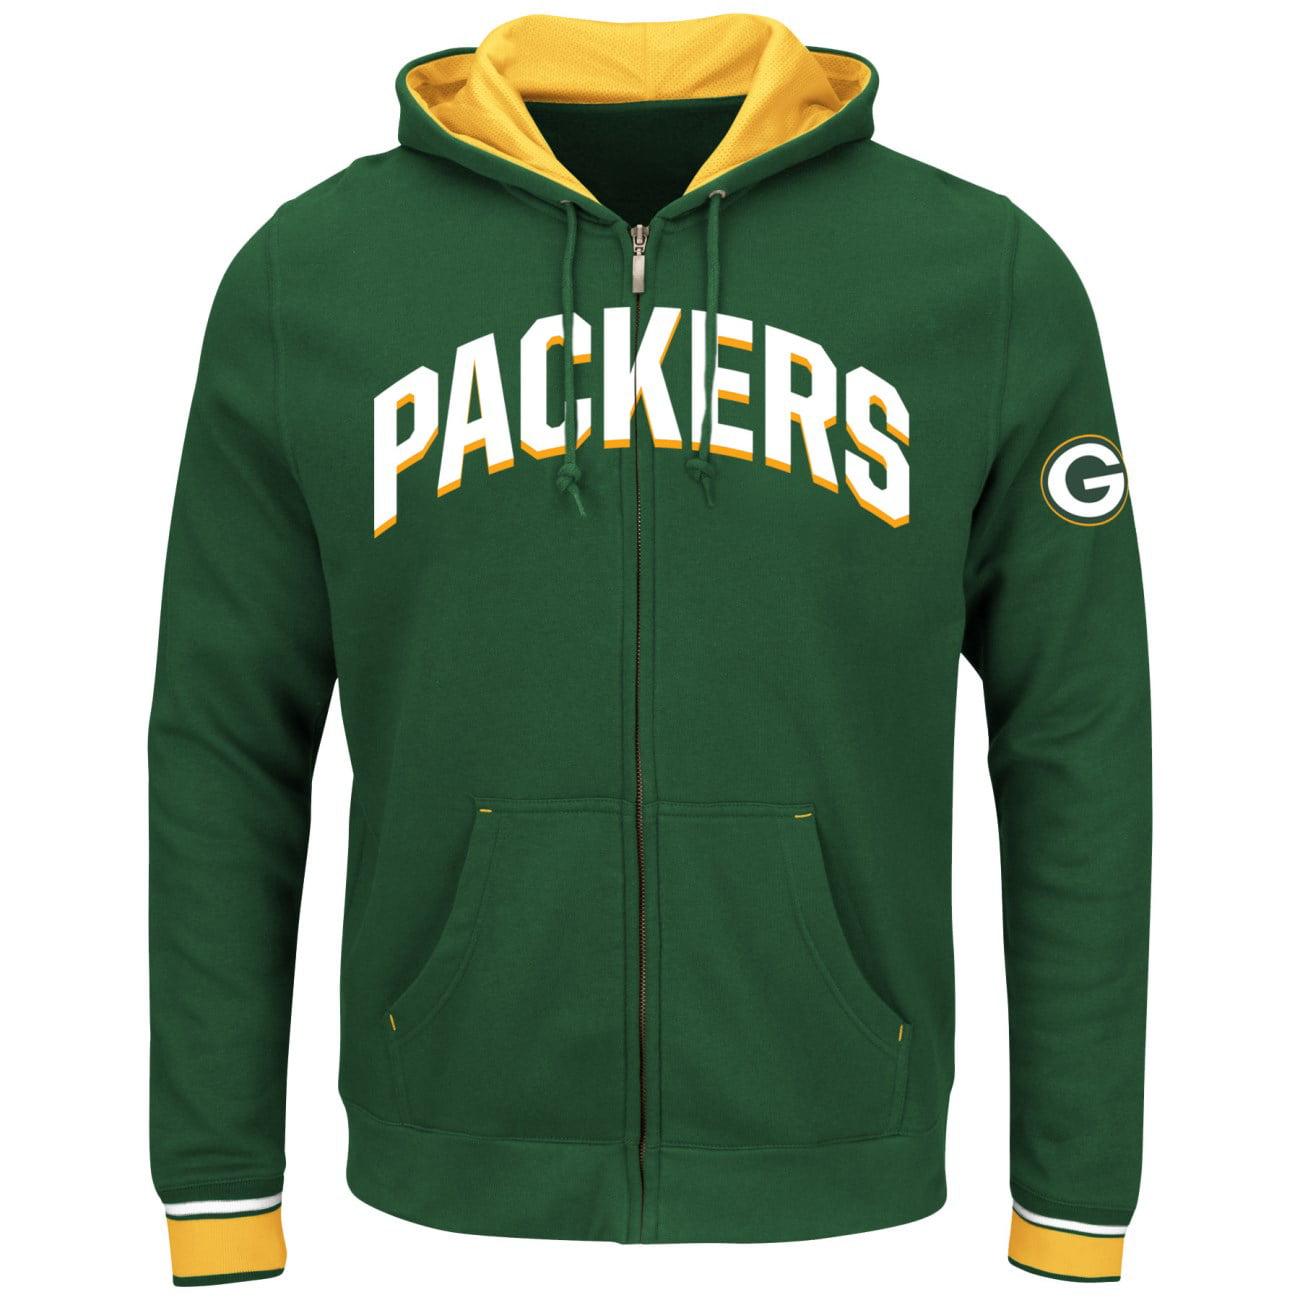 "Green Bay Packers Majestic NFL ""Anchor Point 2"" Men's Full Zip Hooded Sweatshirt"